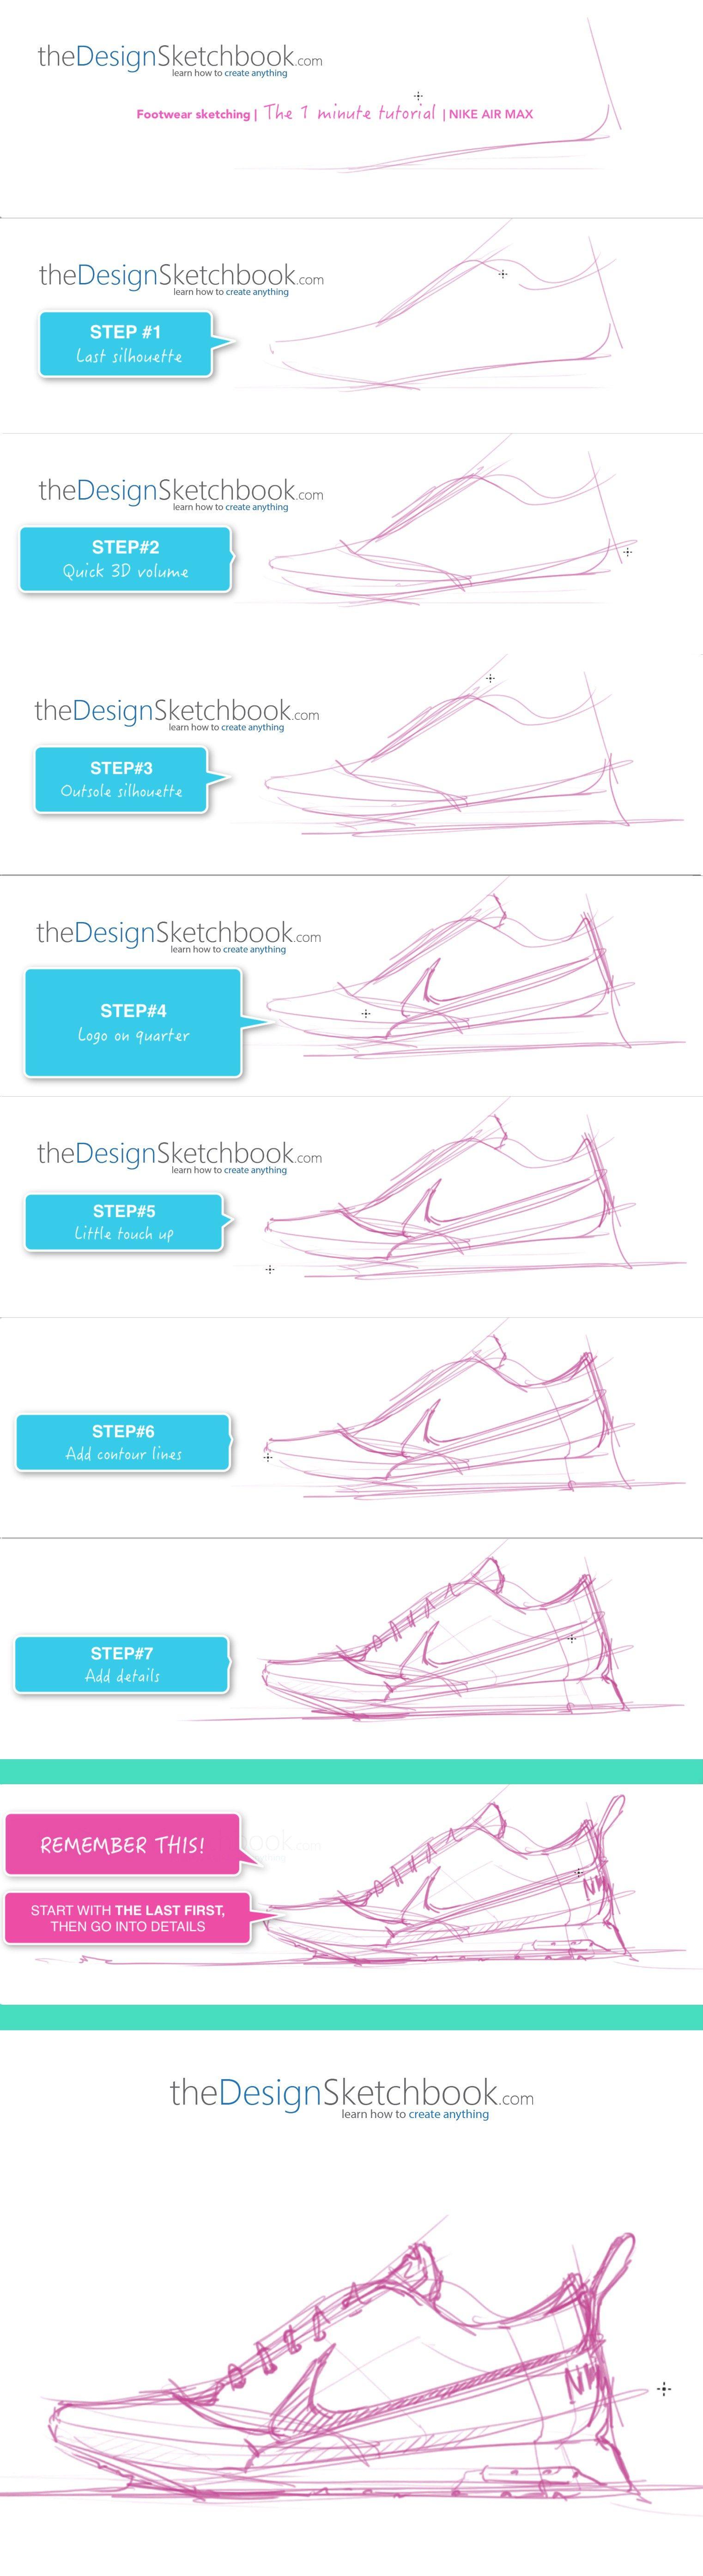 Nike Air Max Design sketching - The design sketchbook - the 1 minute tutorial More